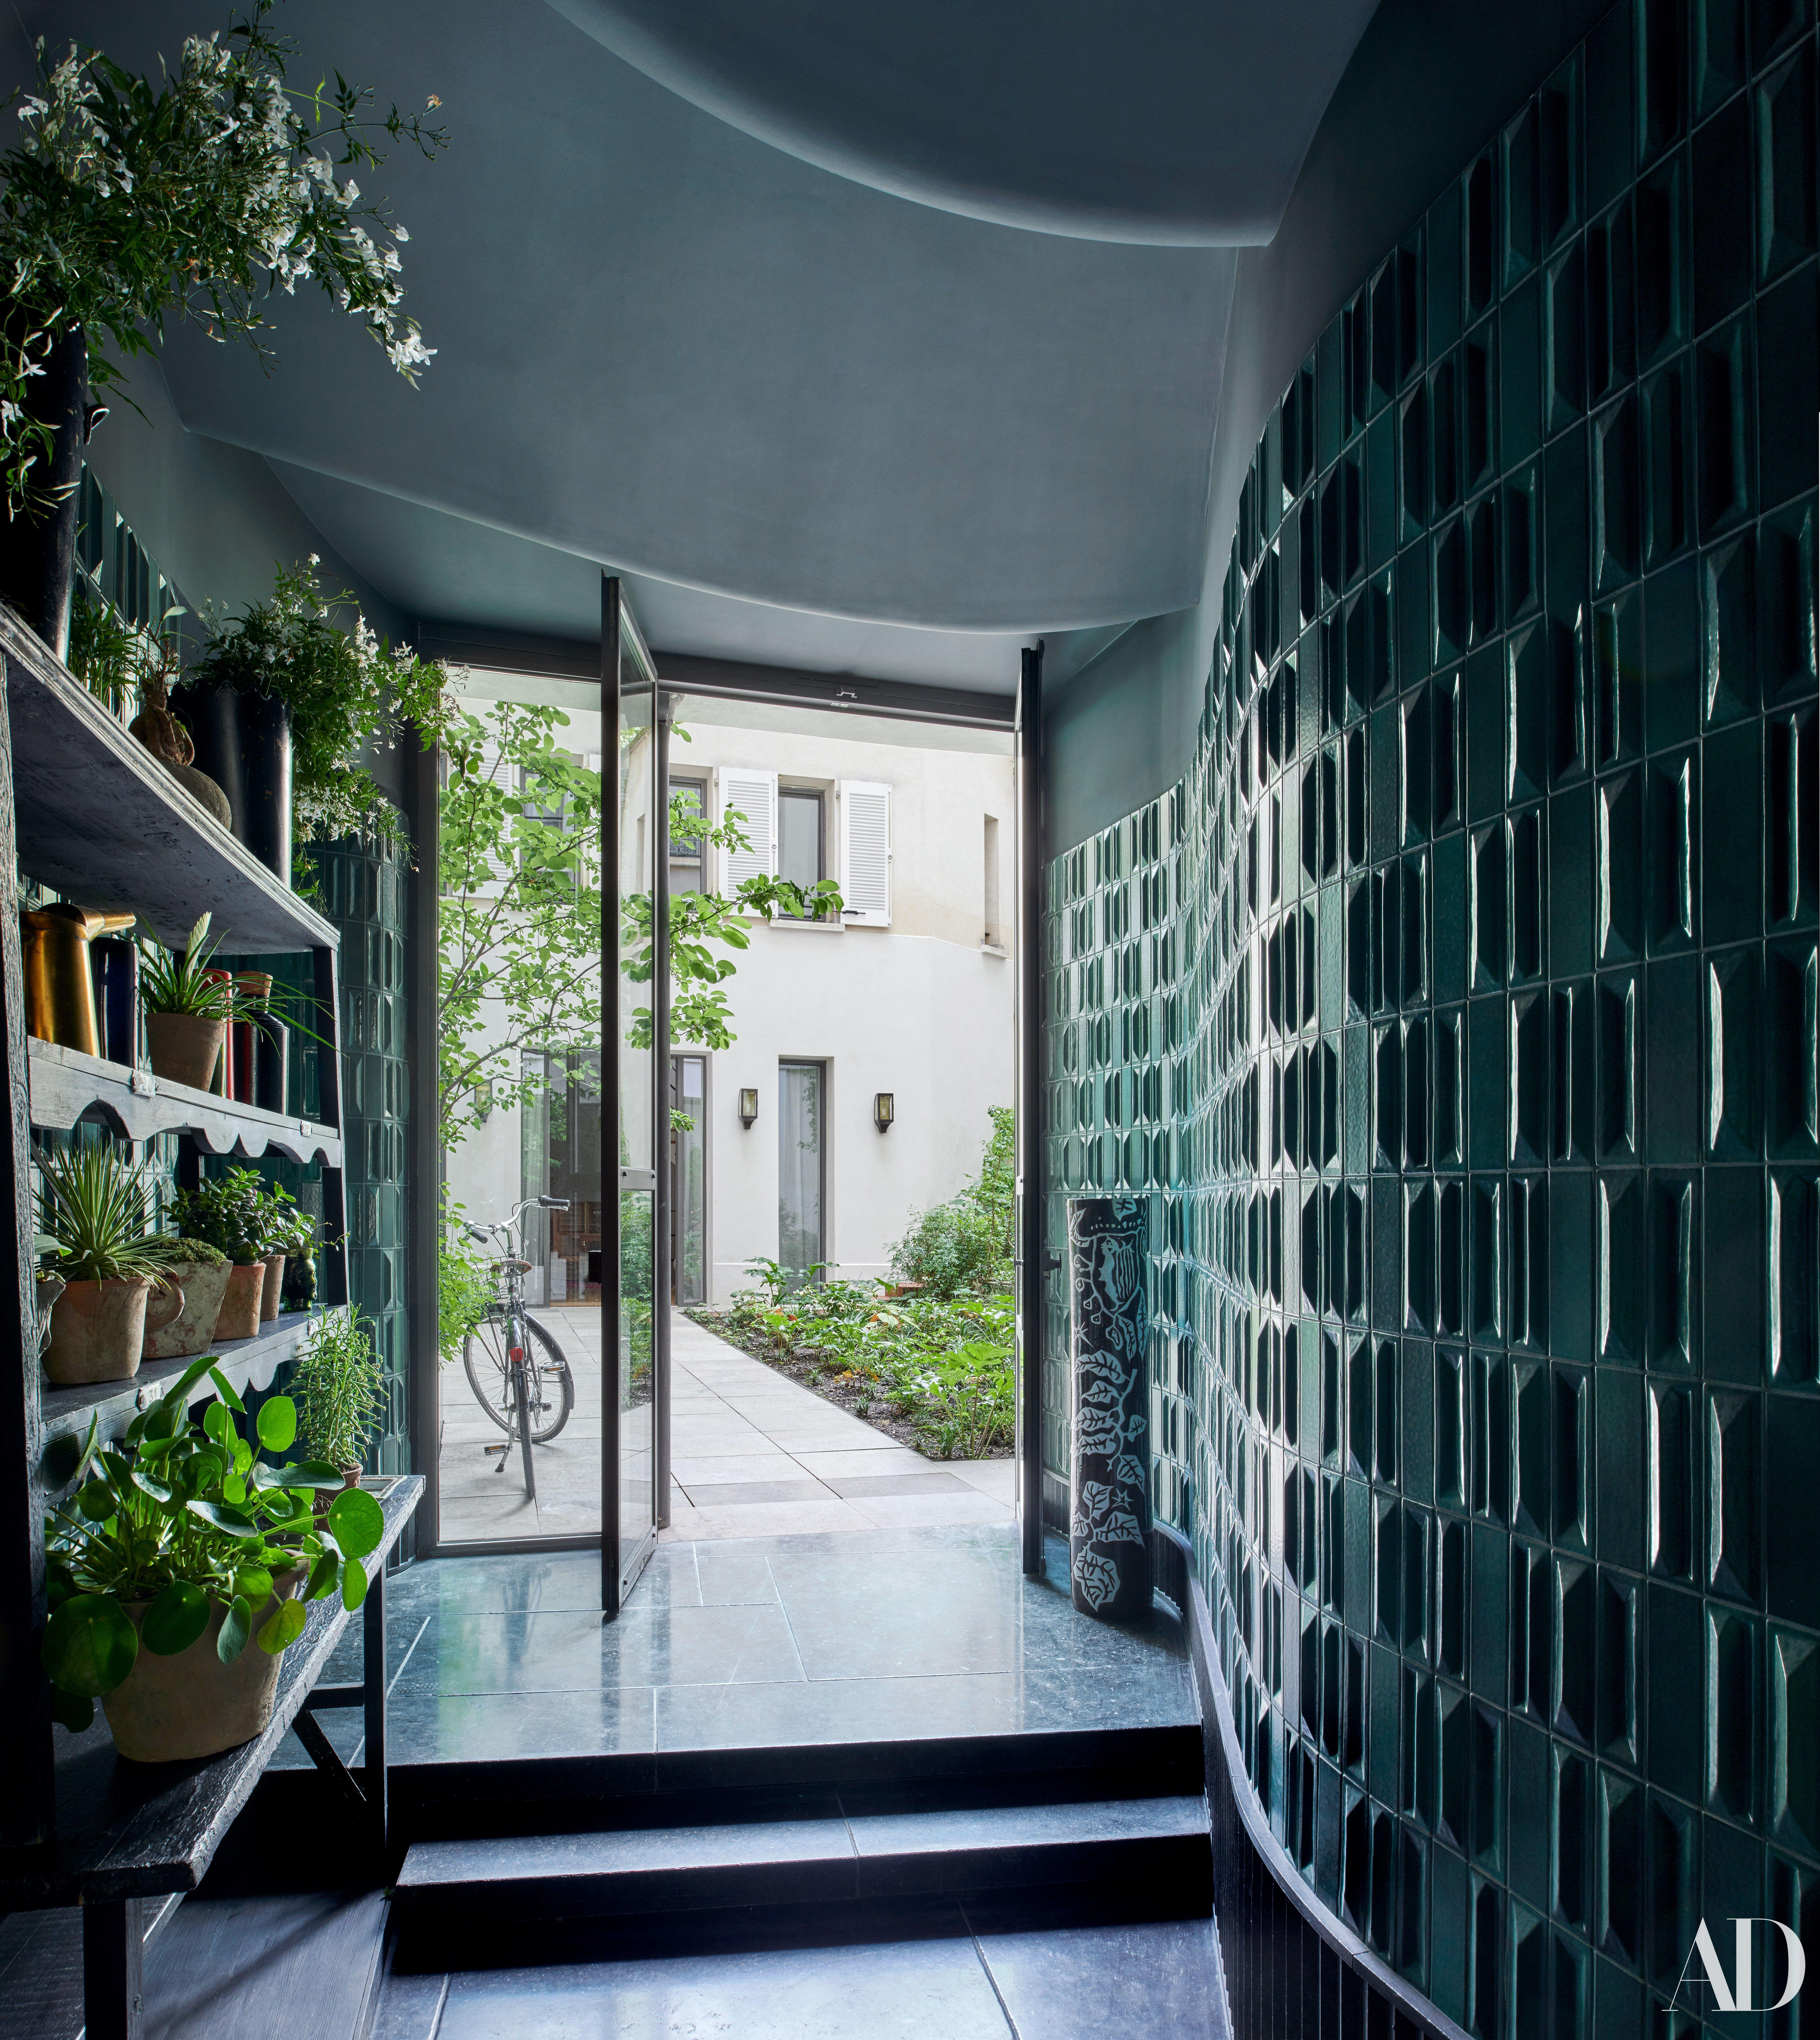 World Of Architecture 16 Simple Elegant And Affordable: See Inside Julie De Libran's Industrial Yet Elegant Home